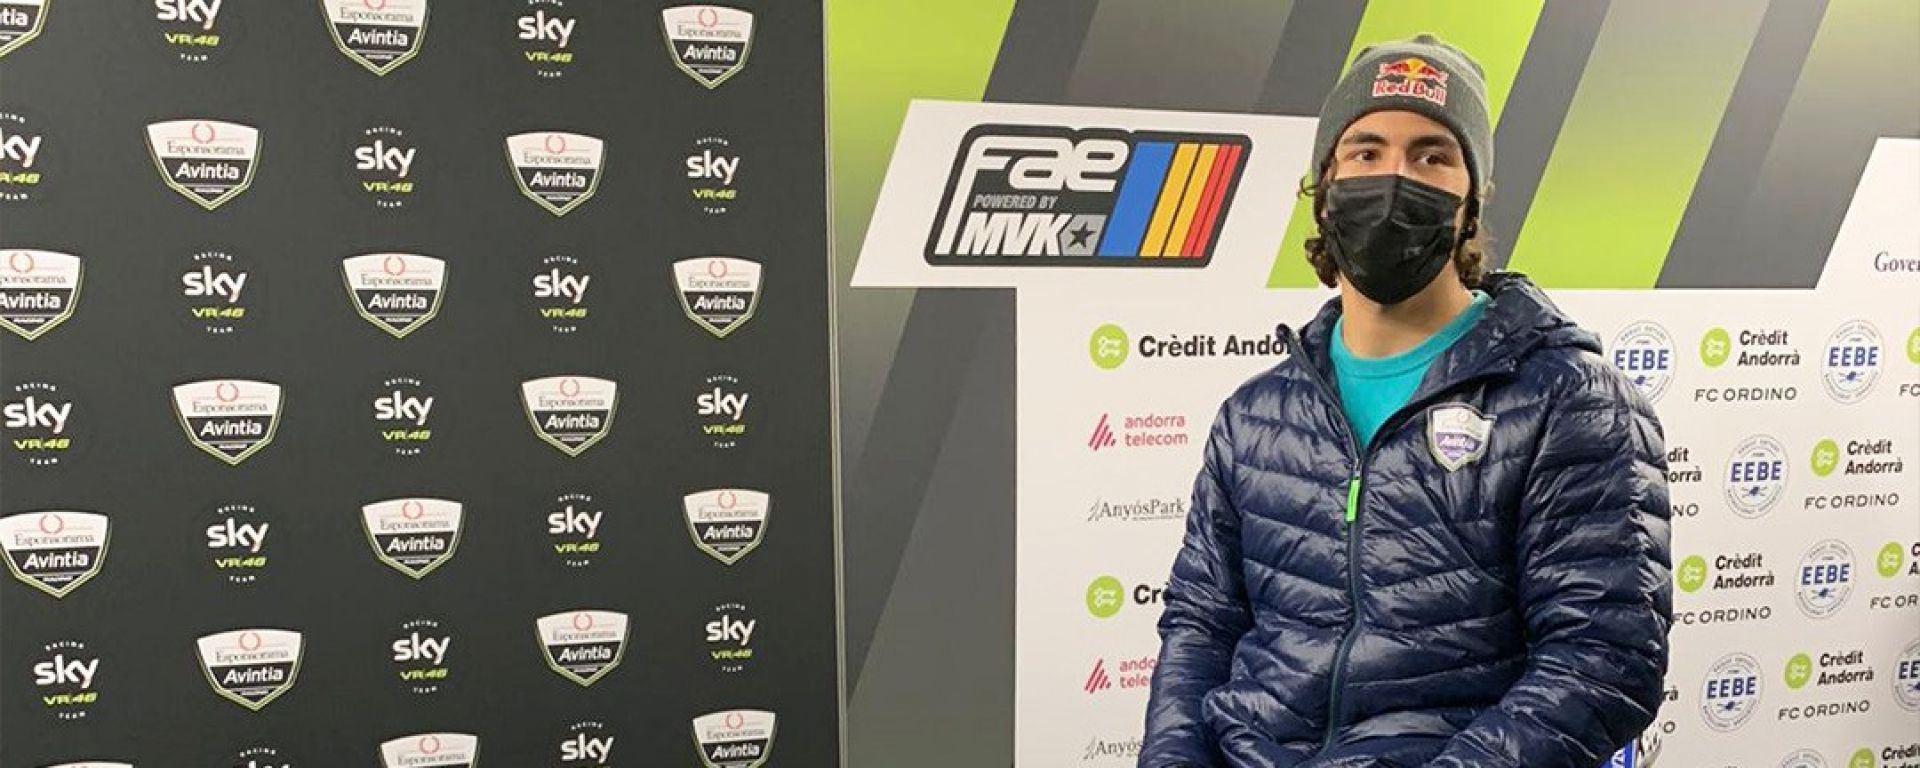 MotoGP, presentazione Team Avintia Esponsorama 2021, Enea Bastianini